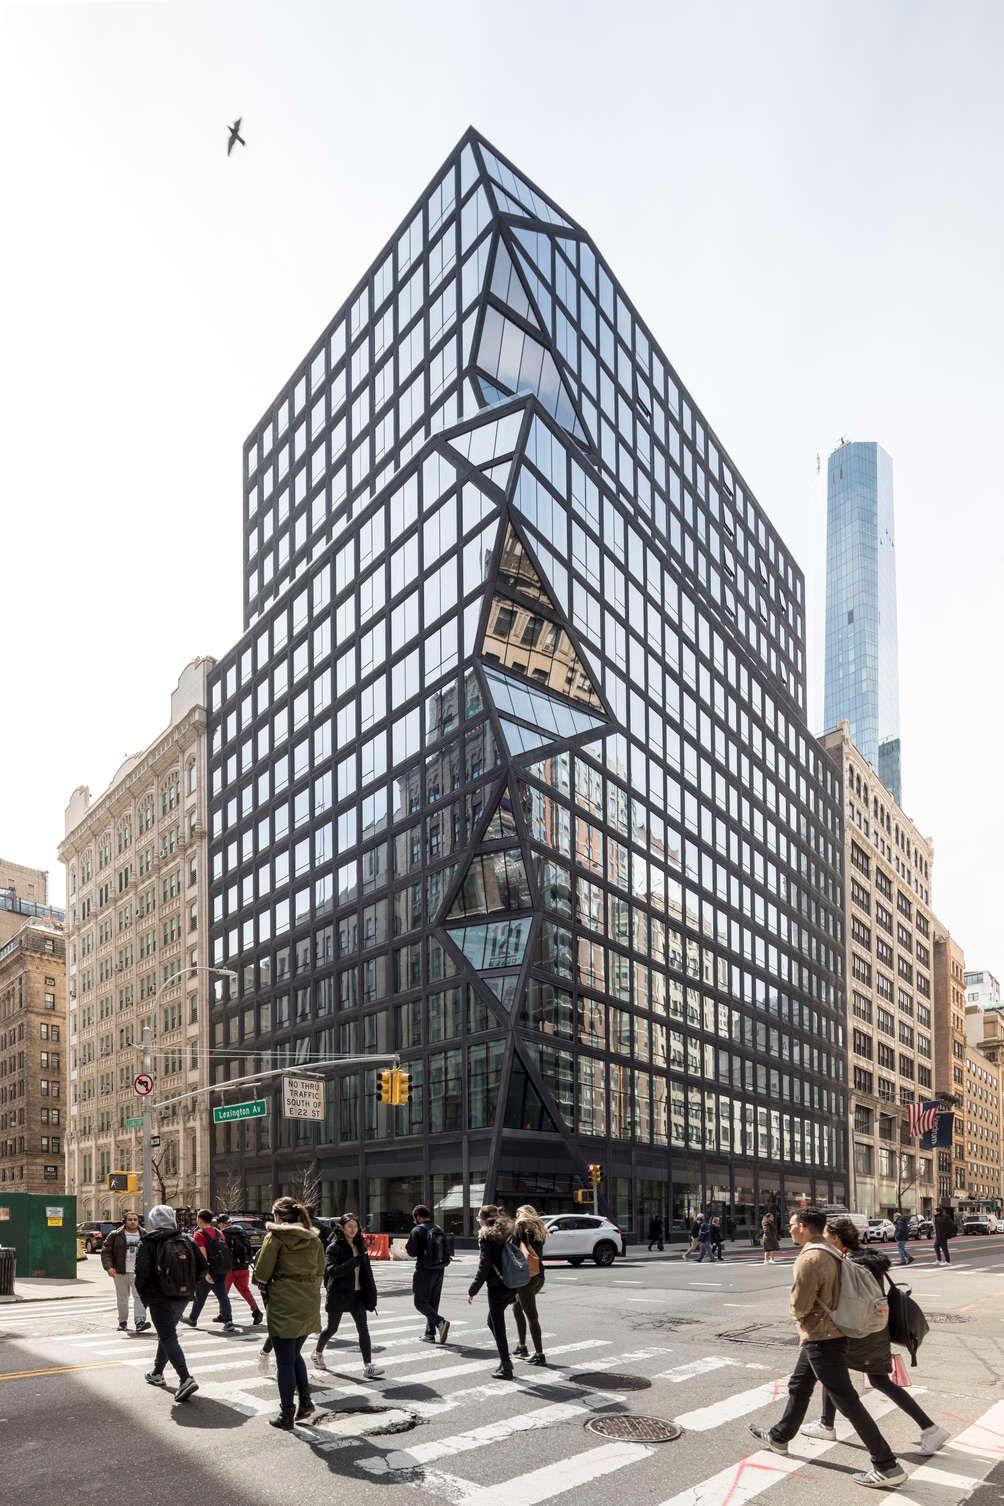 121 East 22nd Street, OMA, Rem Koolhaas, Gramercy condo